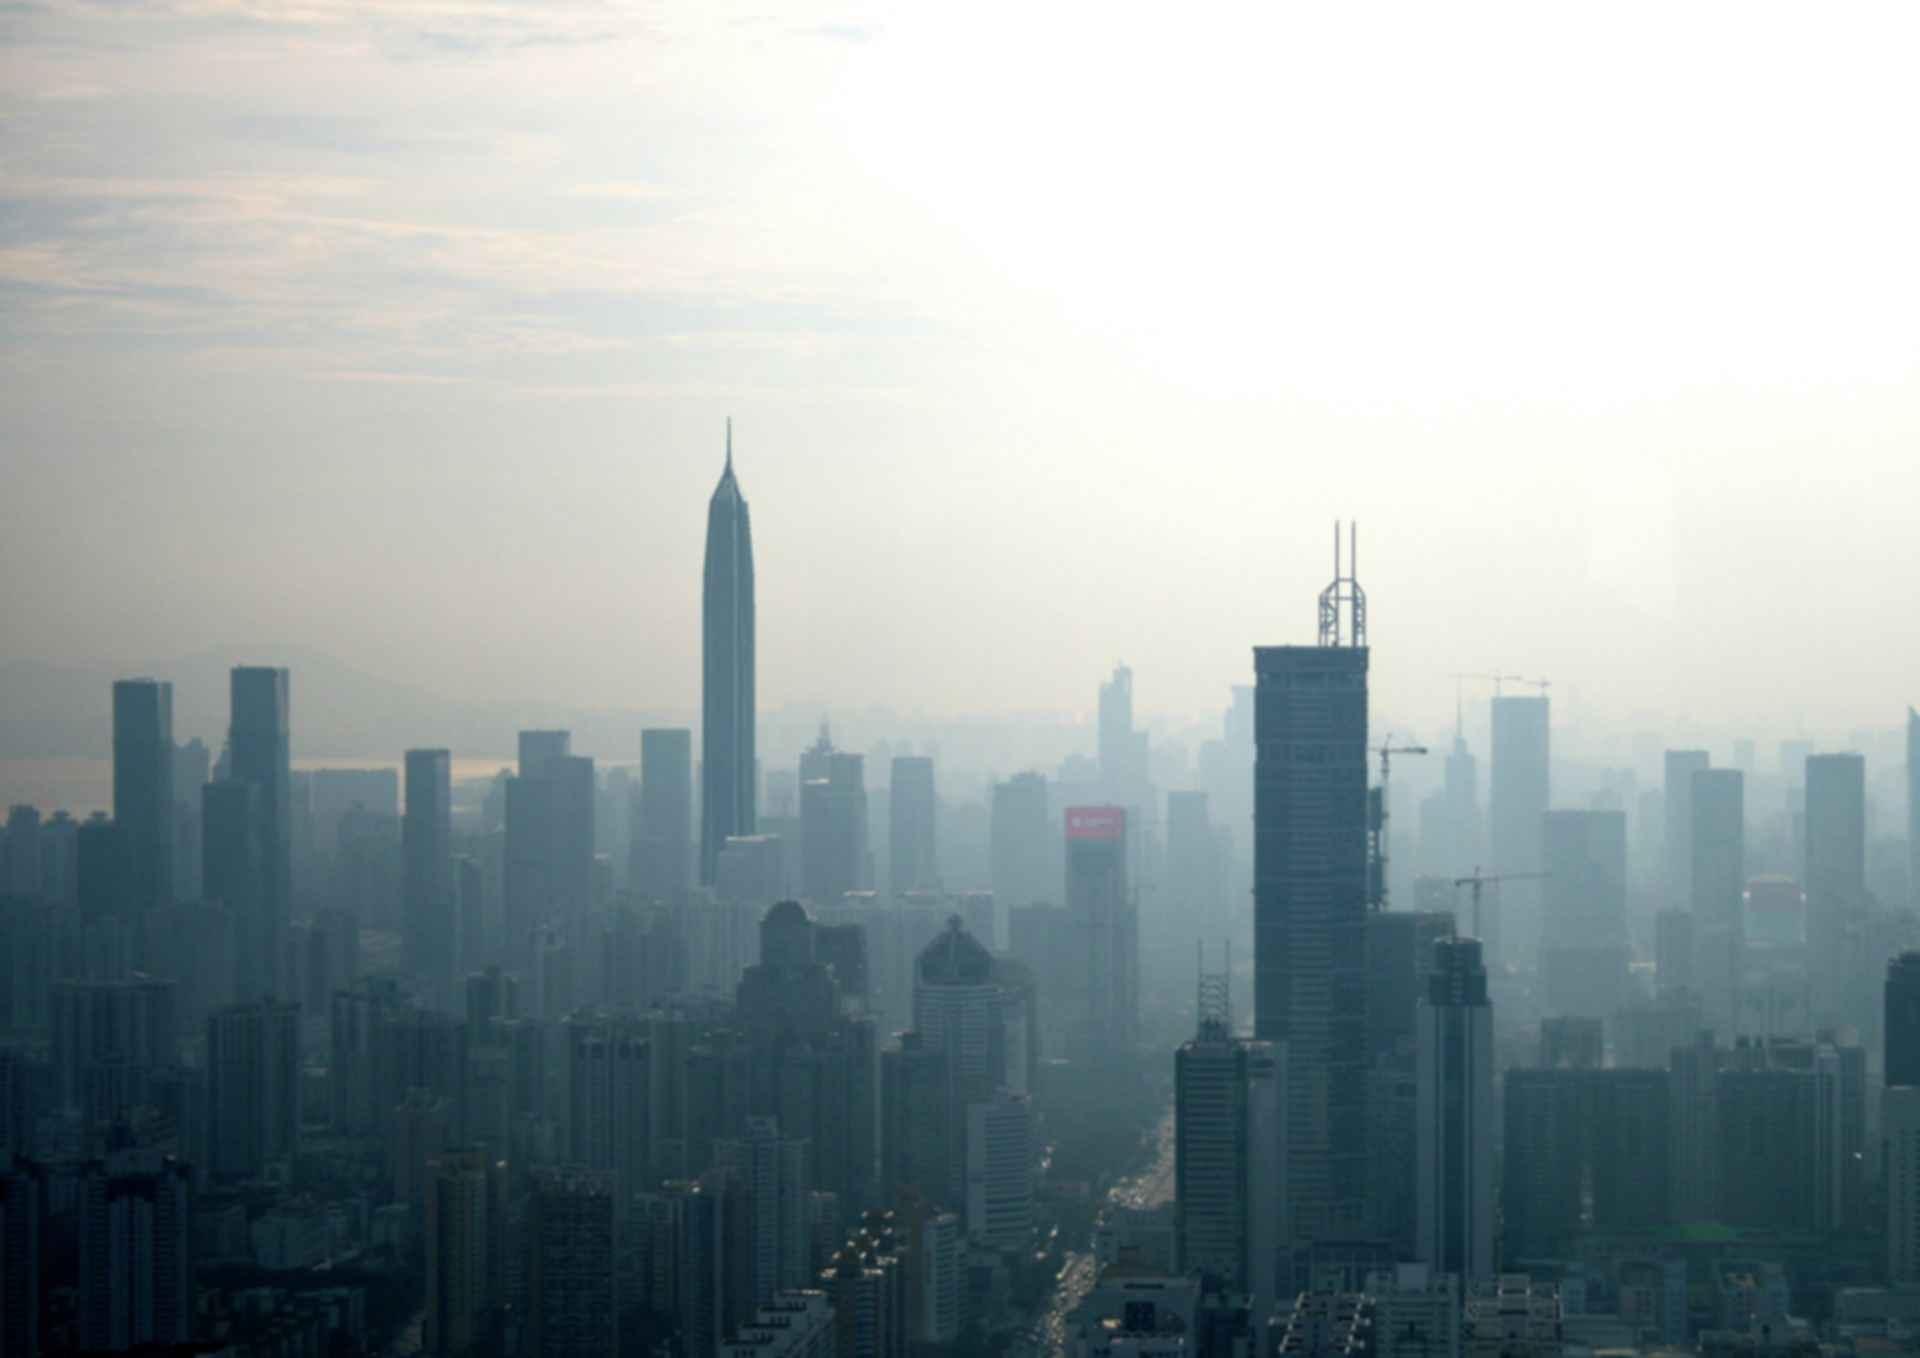 Ping An Finance Center - Concept Design/Landscape